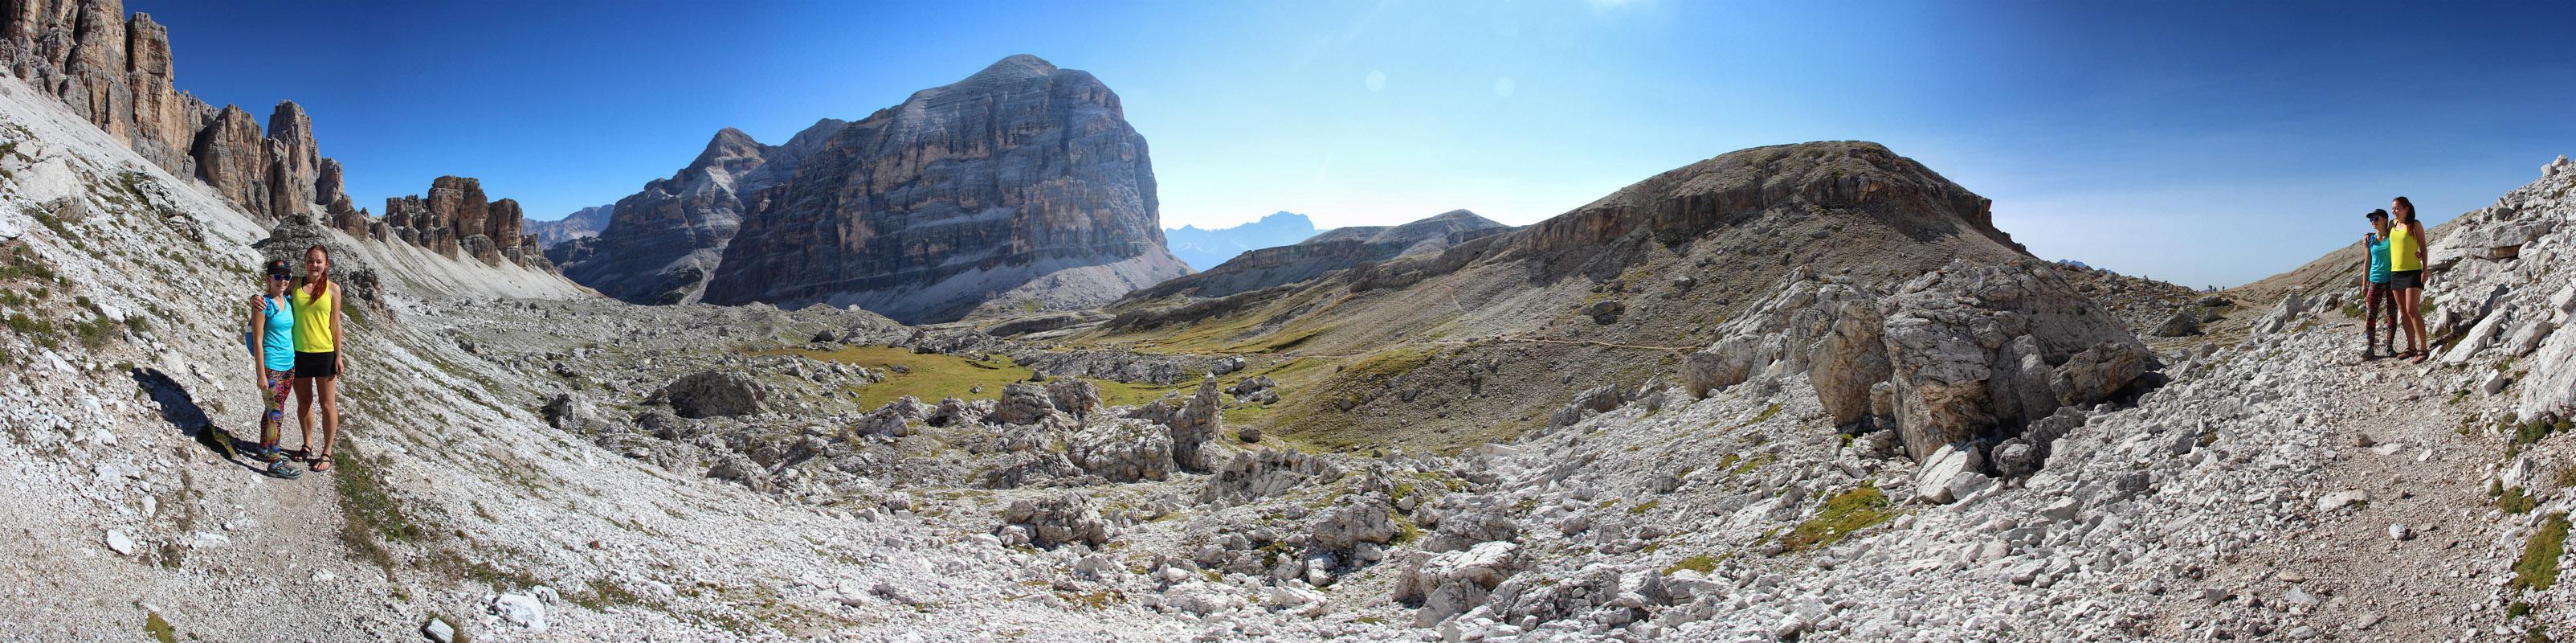 Panoráma z Ciadin de Lagazuoi, Tofana di Rozes, Dolomity